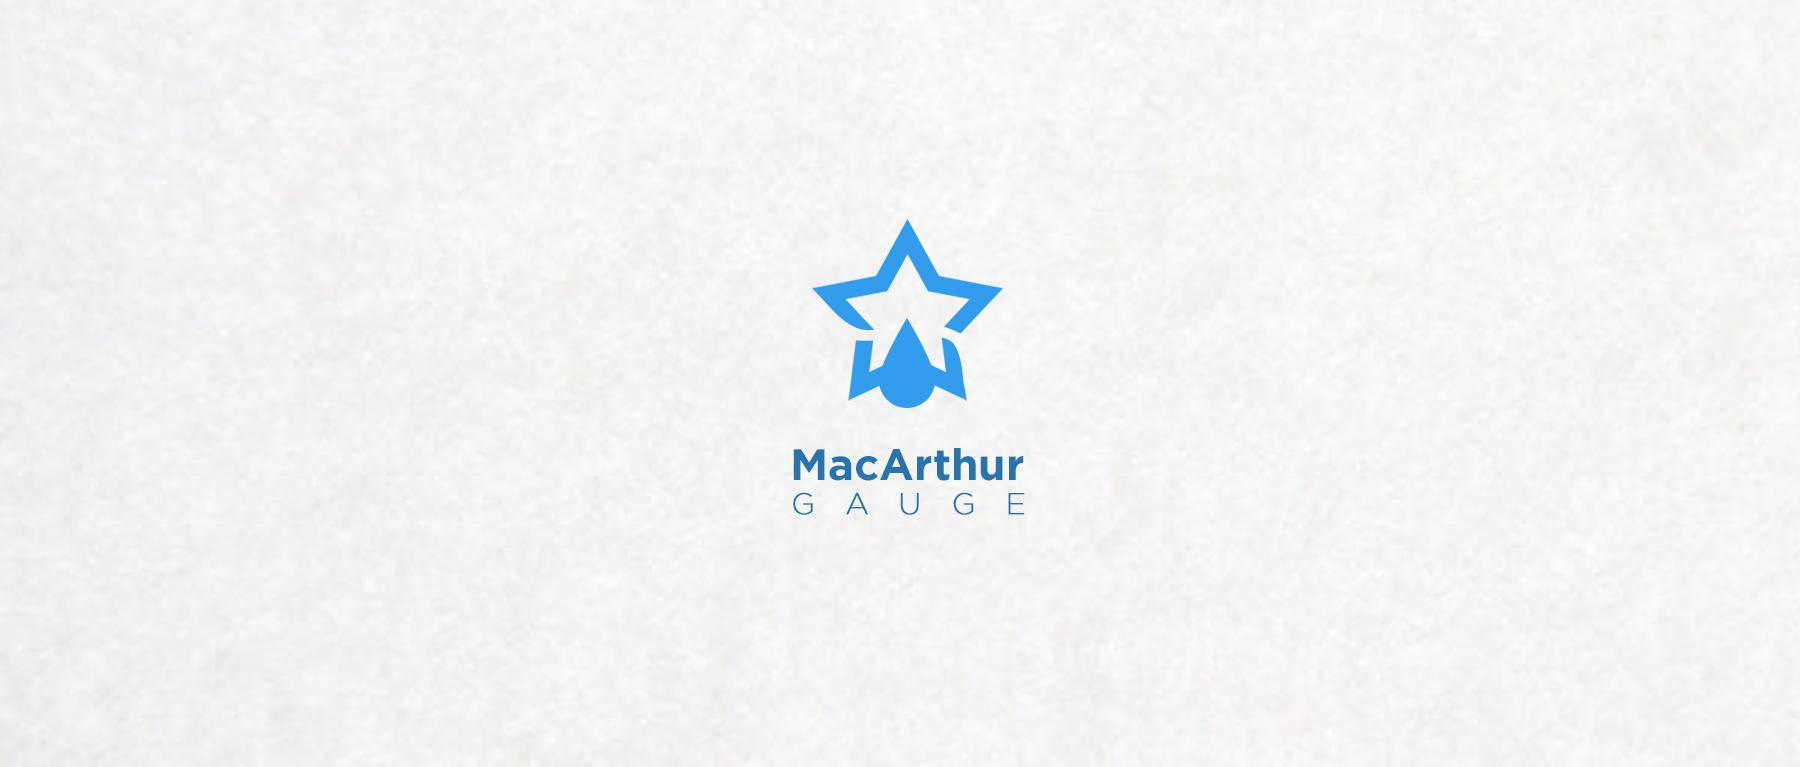 Logo Design by Private User - Entry No. 66 in the Logo Design Contest Fun Logo Design for MacArthur Gauge.